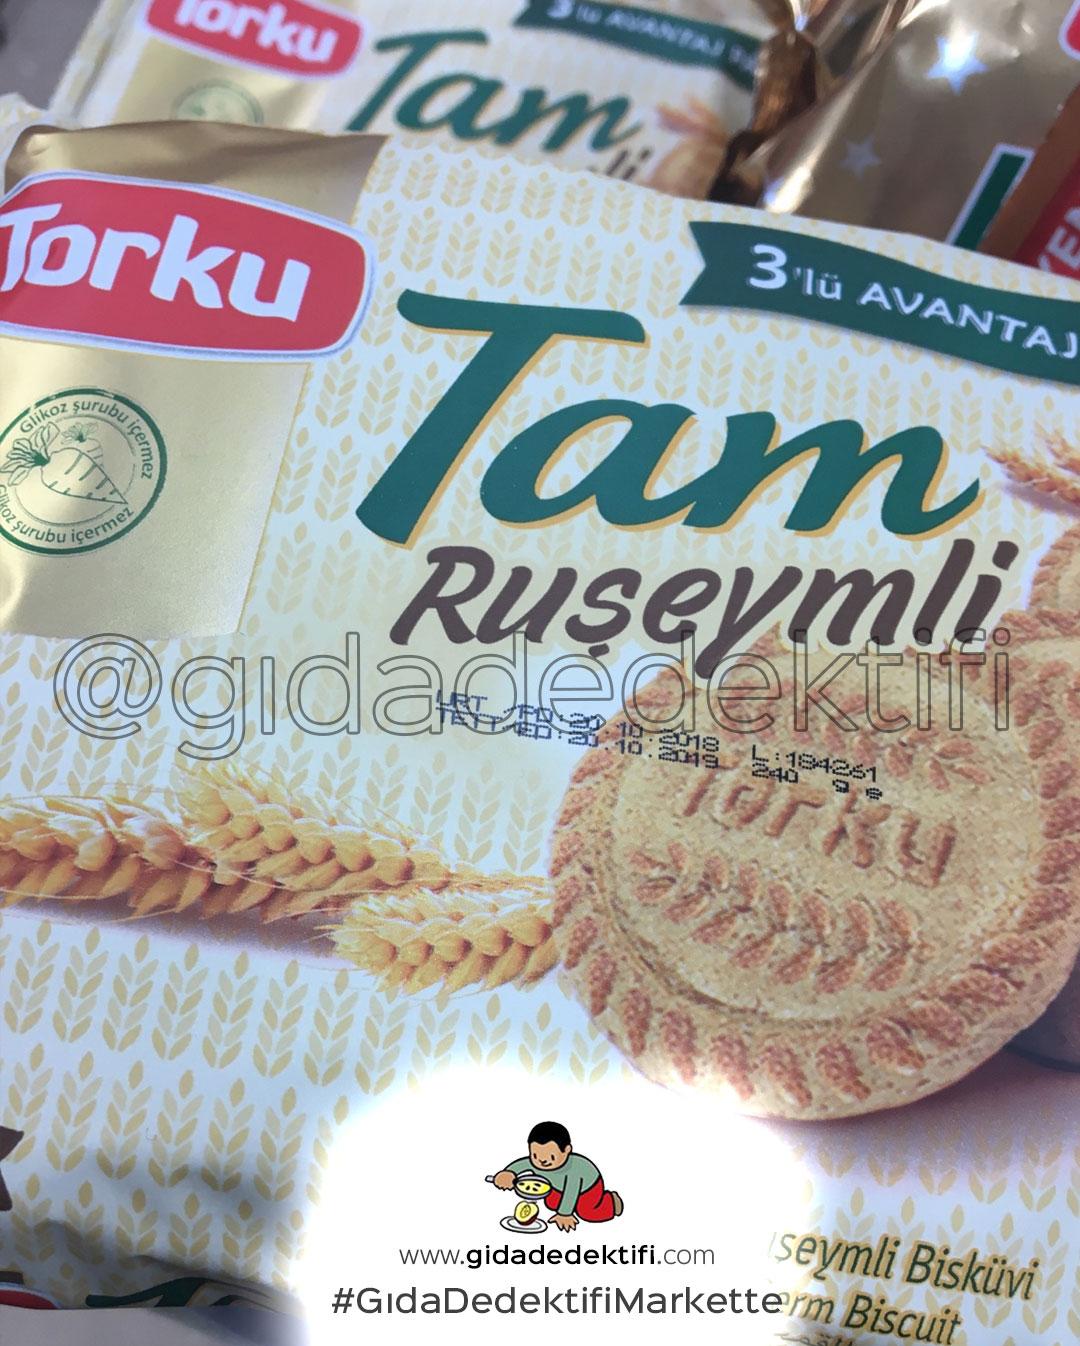 Torku-Tam-Ruşeymli-market-1